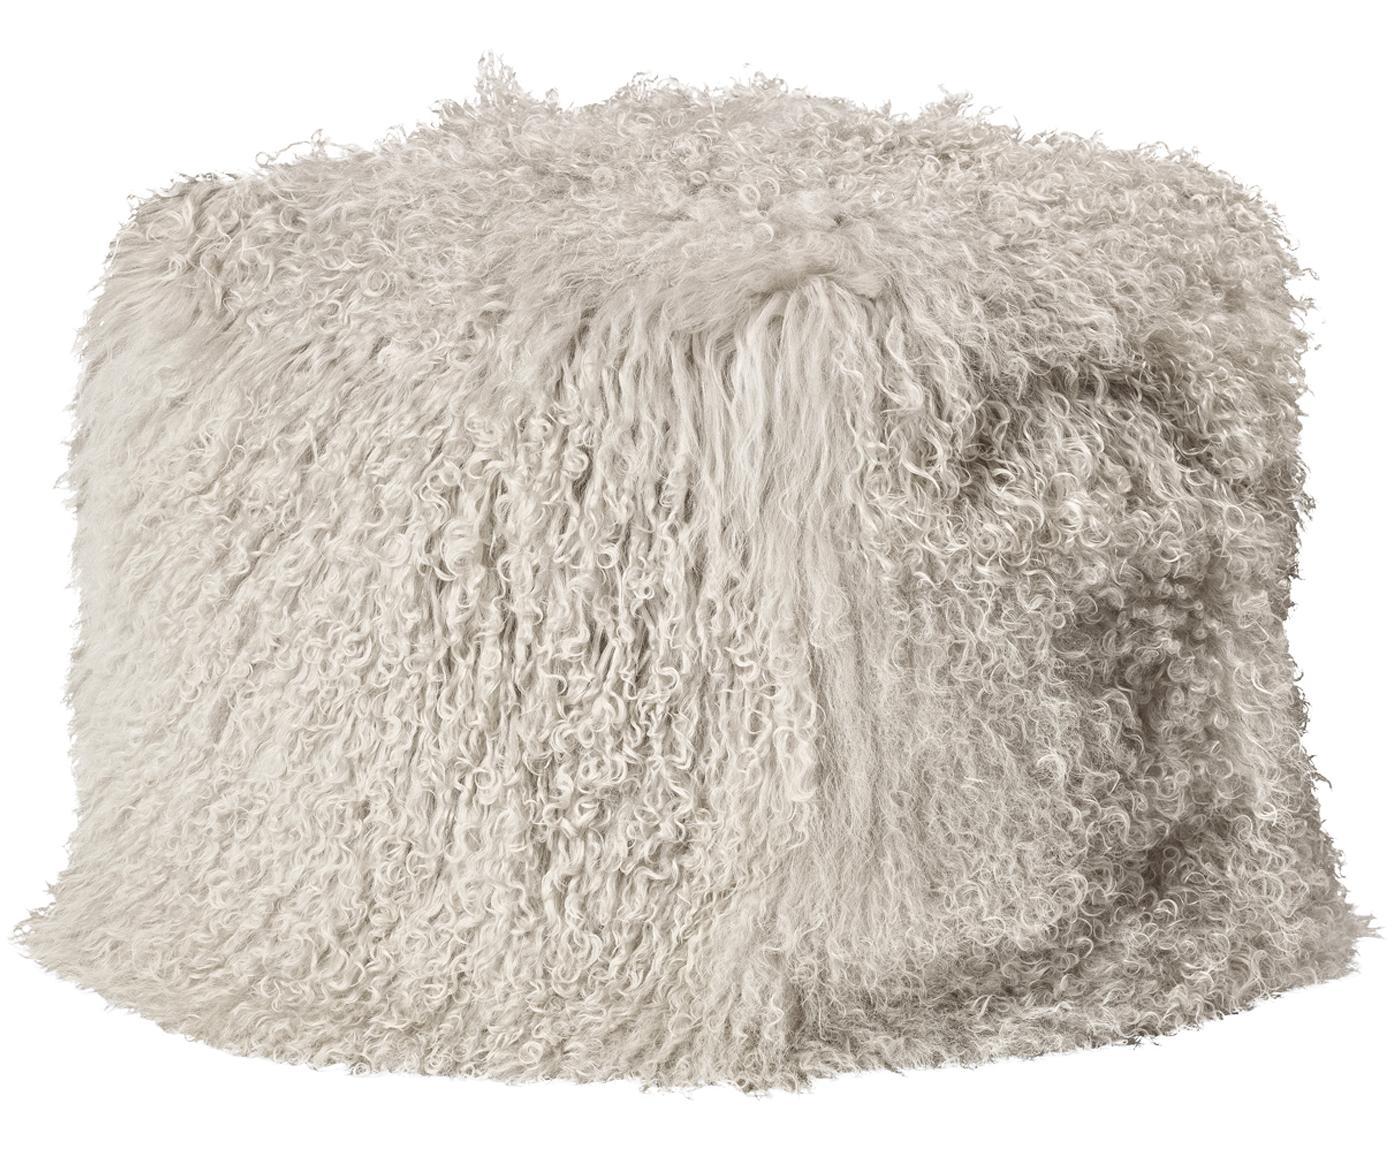 Puf de piel de cordero Cube, Tapizado: piel de cordero tibetano, Interior: poliéster (Charmeuse), Gris pardo, An 60 x Al 40 cm